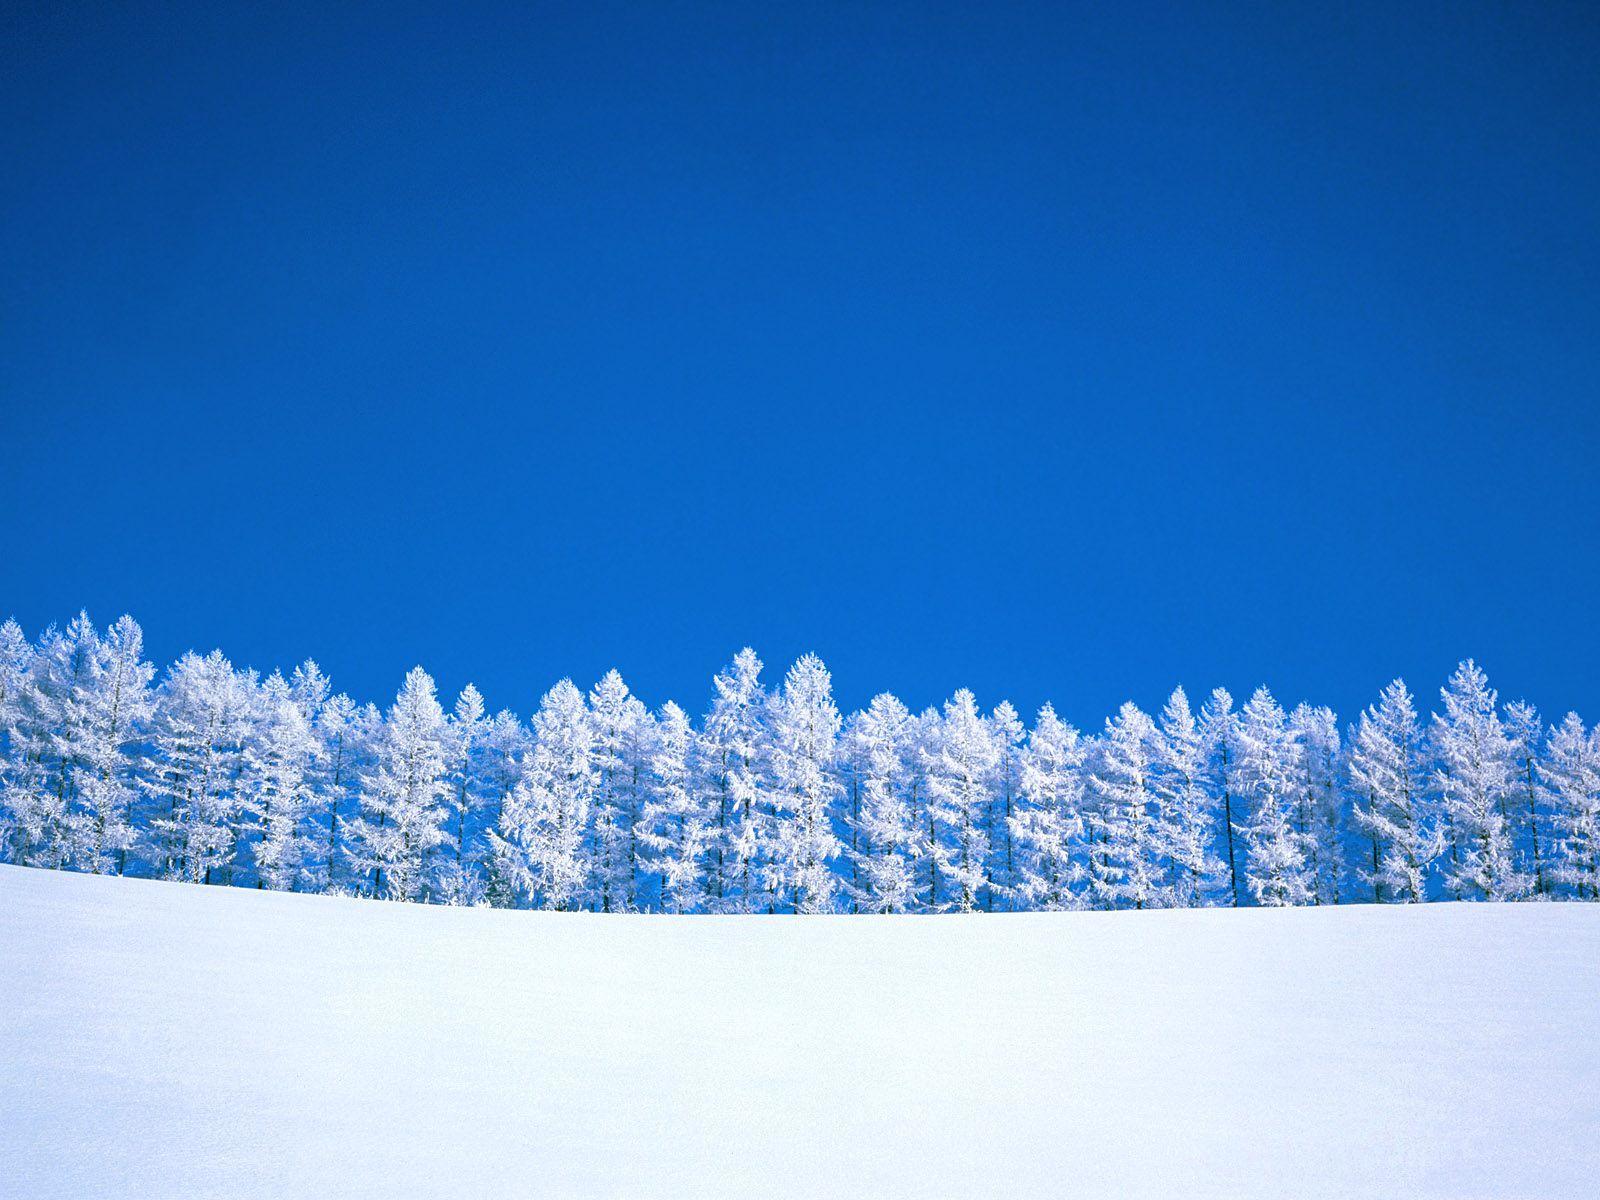 Snow Desktop Backgrounds 4jpg 1600x1200